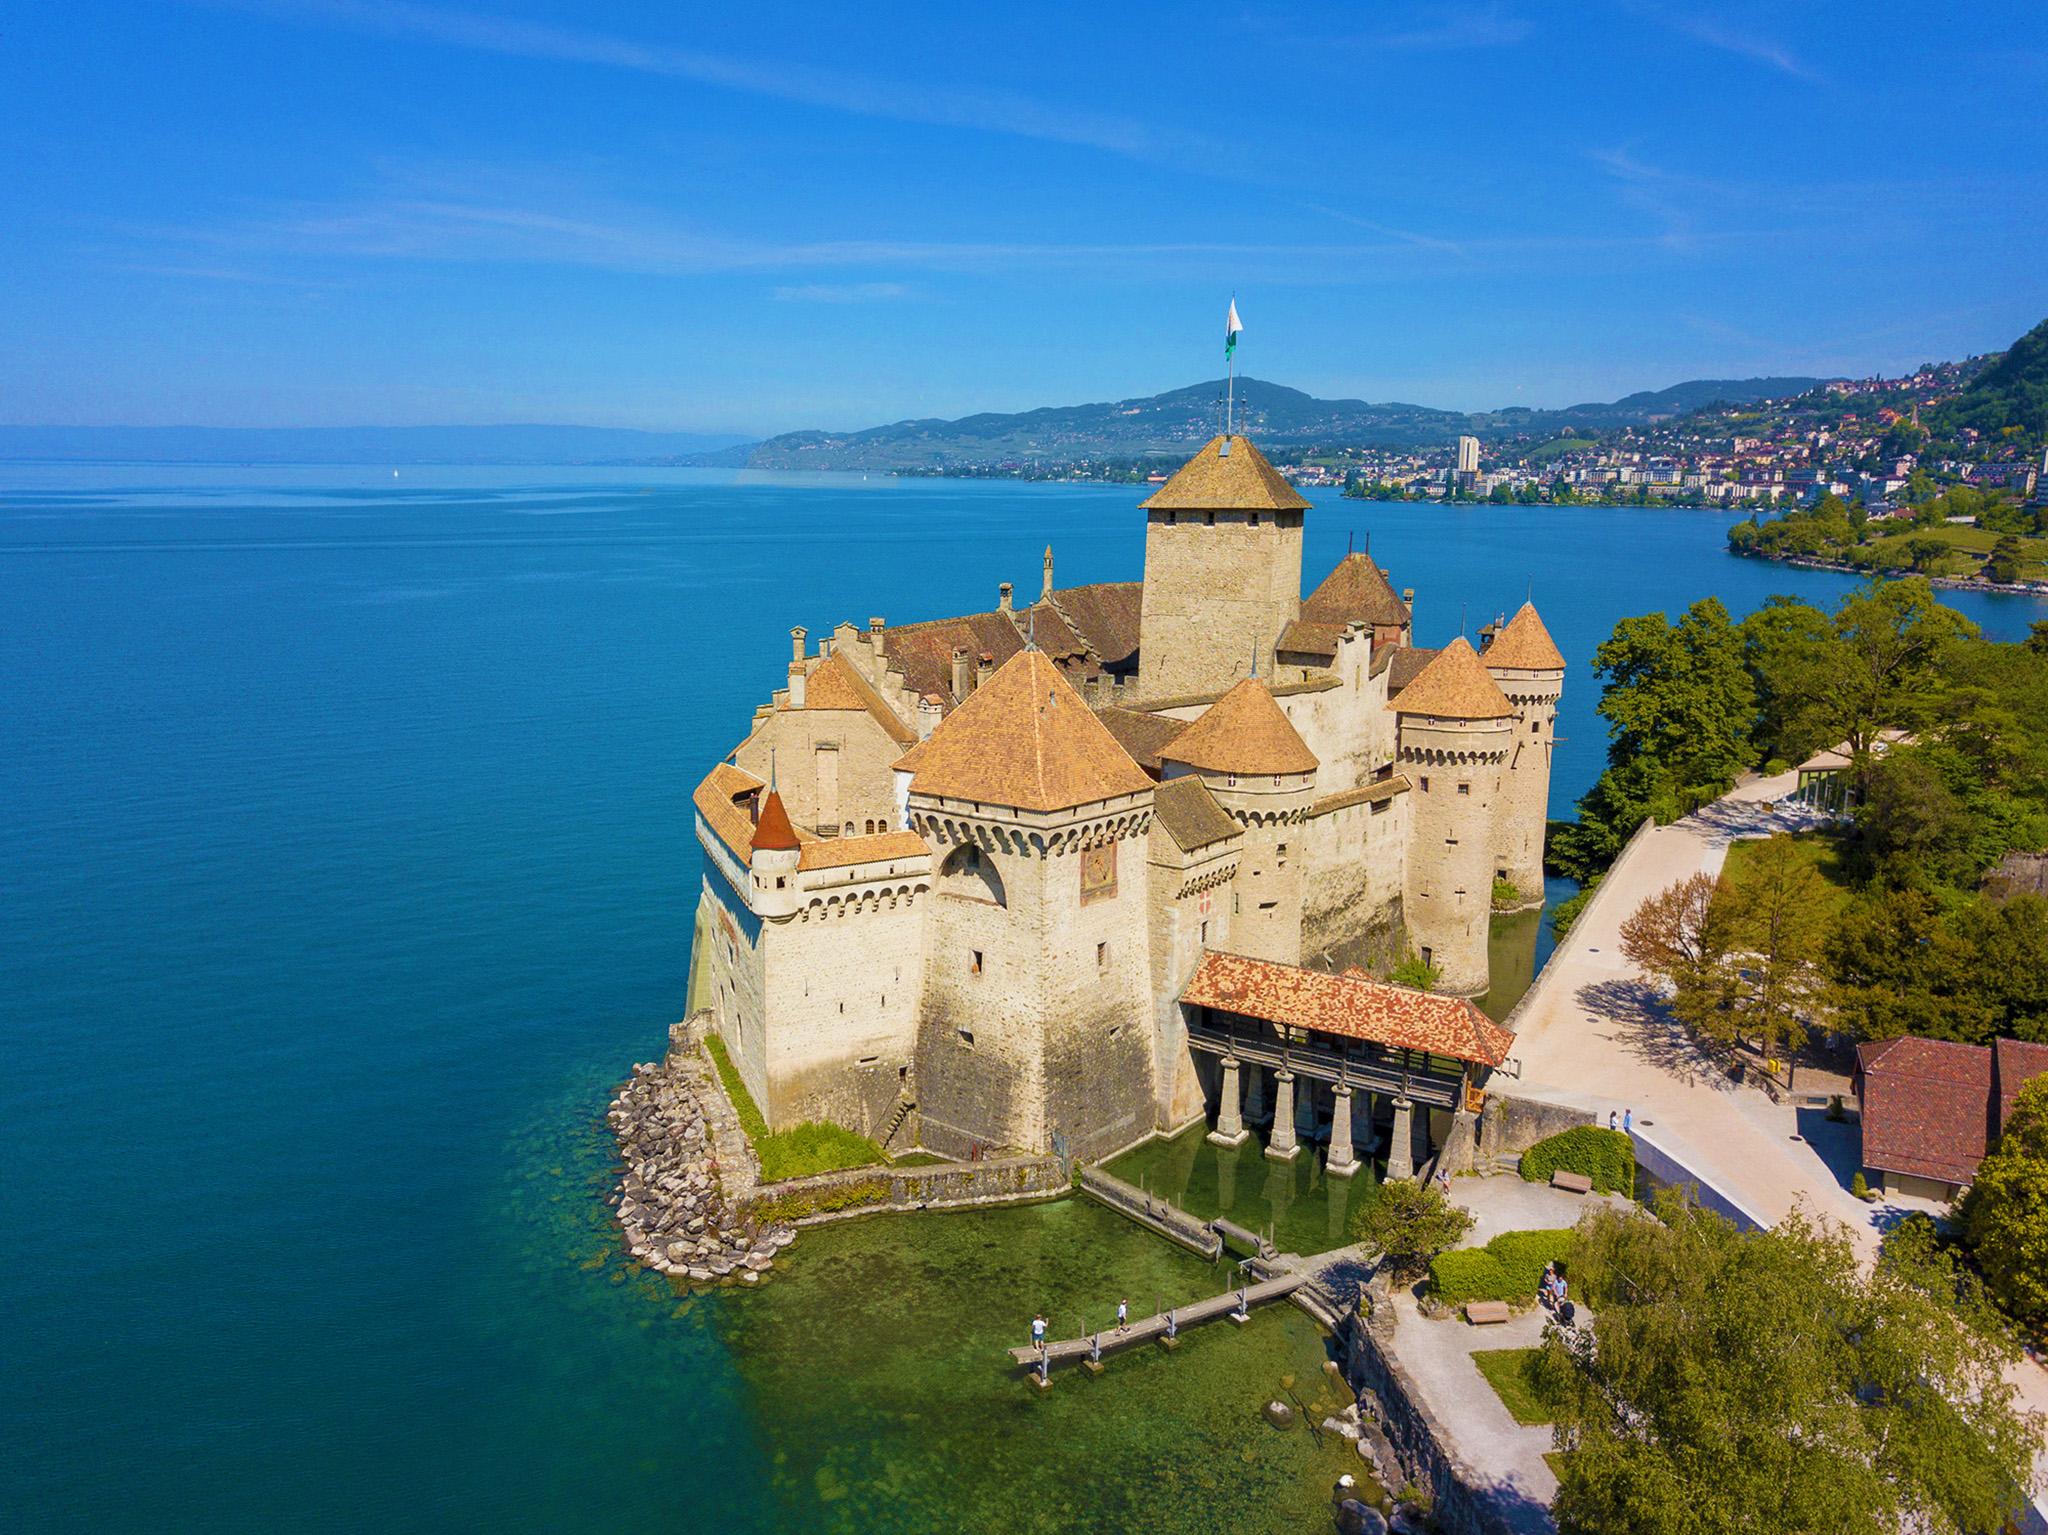 kt_2020_300_Keytours_excursions_Swisstours_chateau chillon1_2048_10